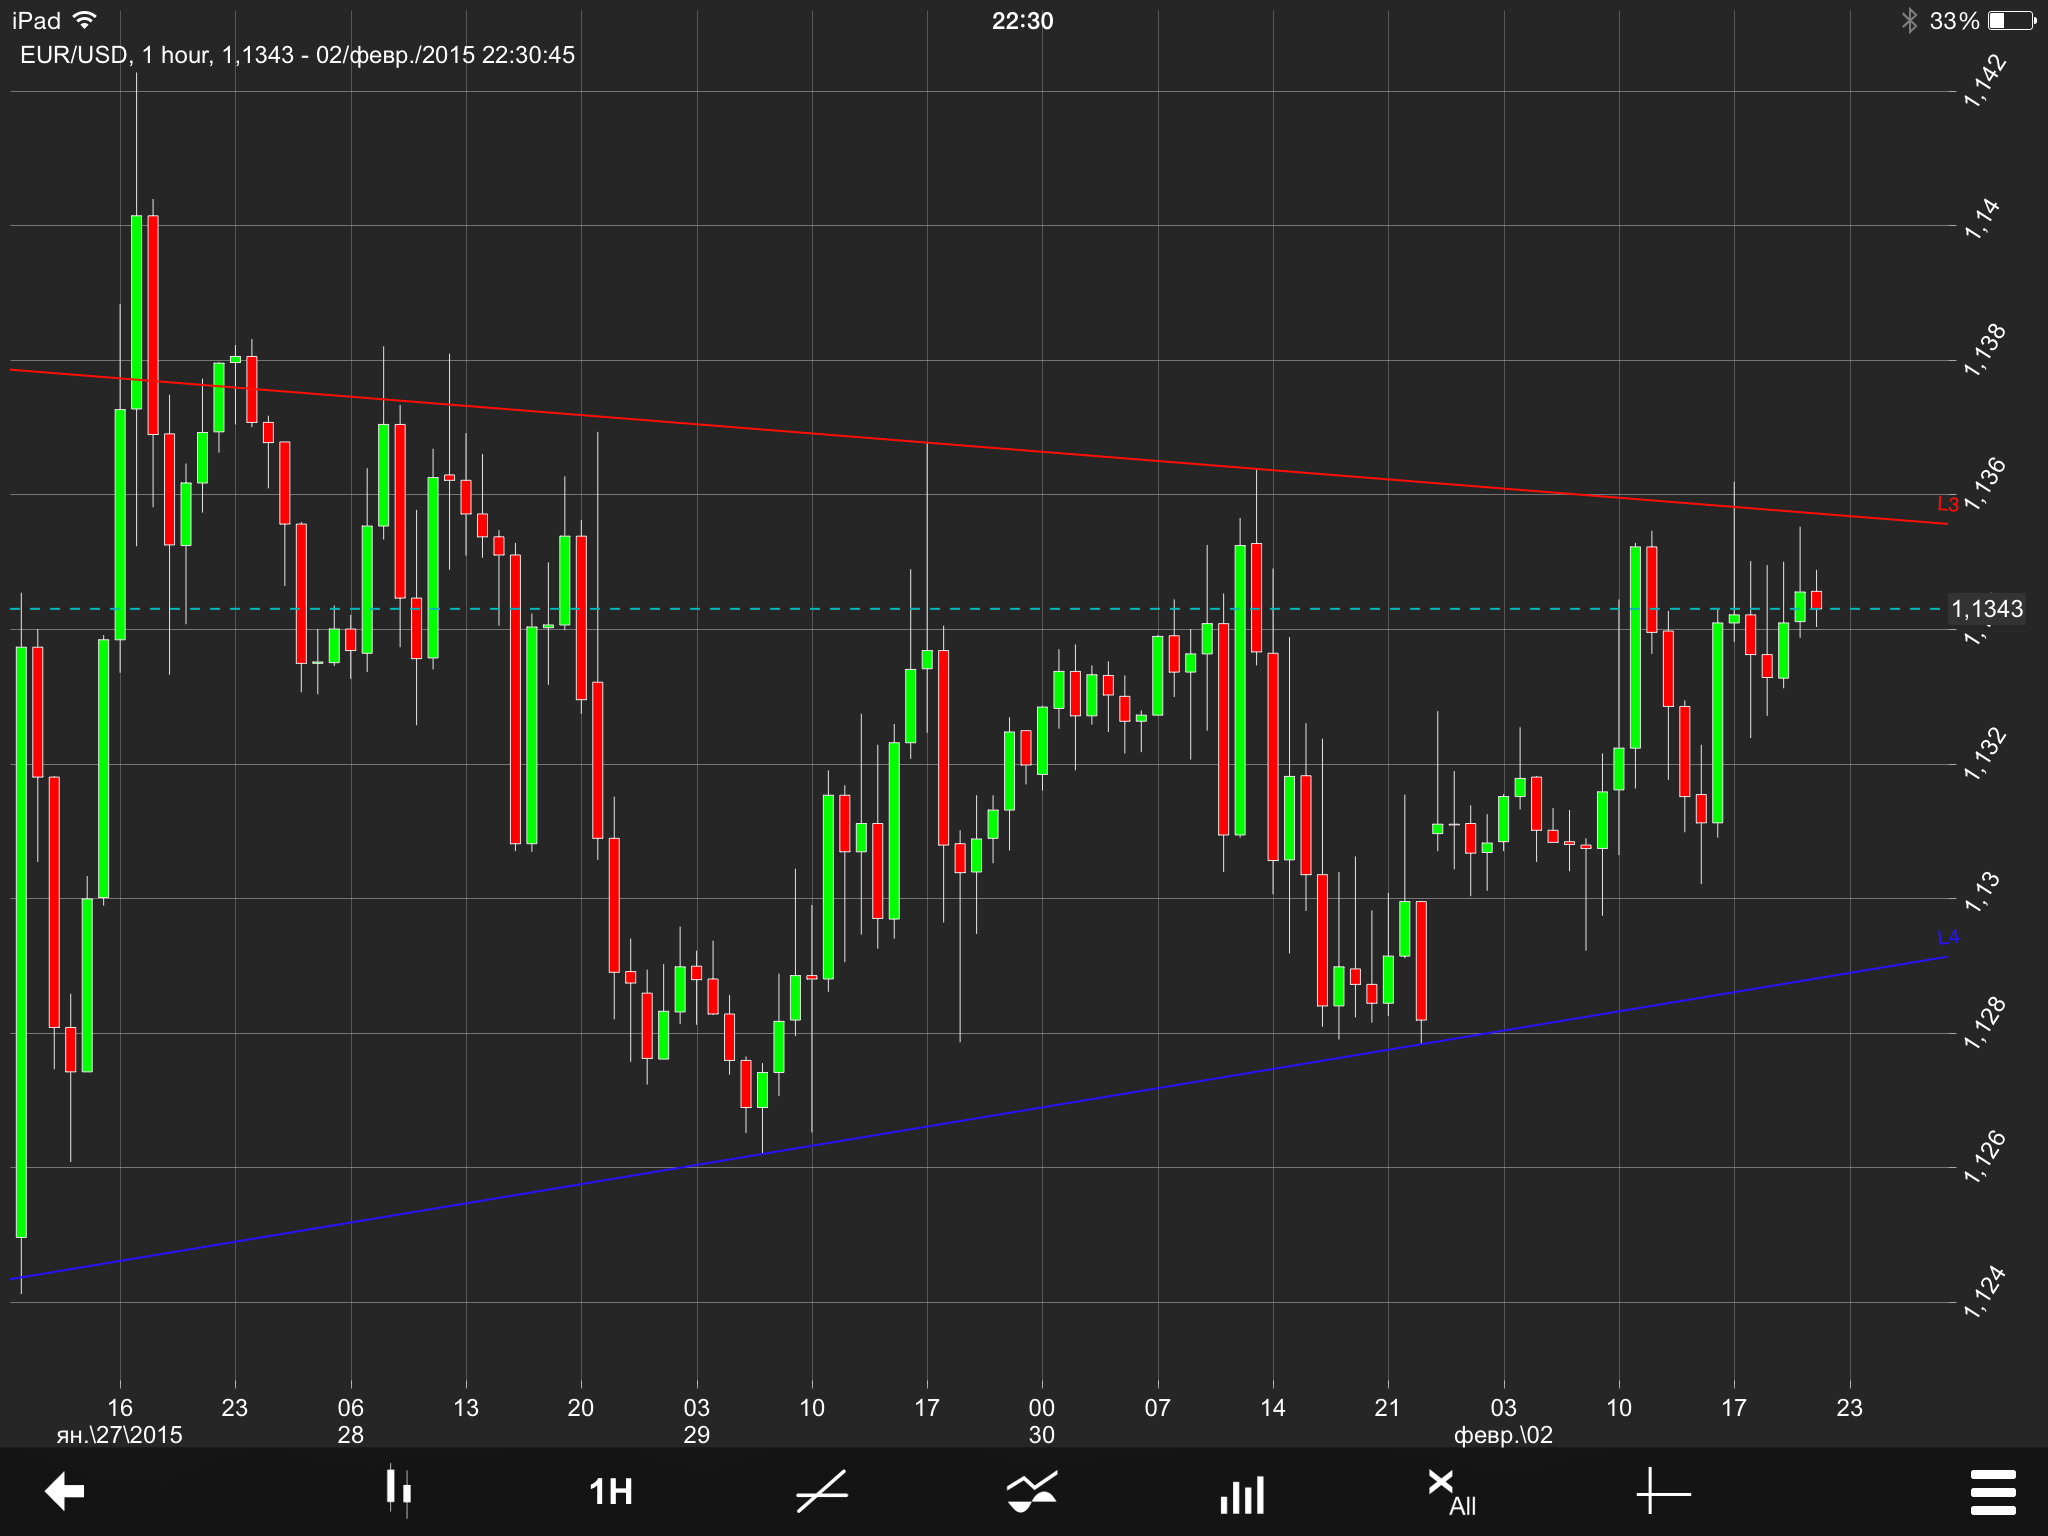 EUR/USD Chart 03 Feb 2015